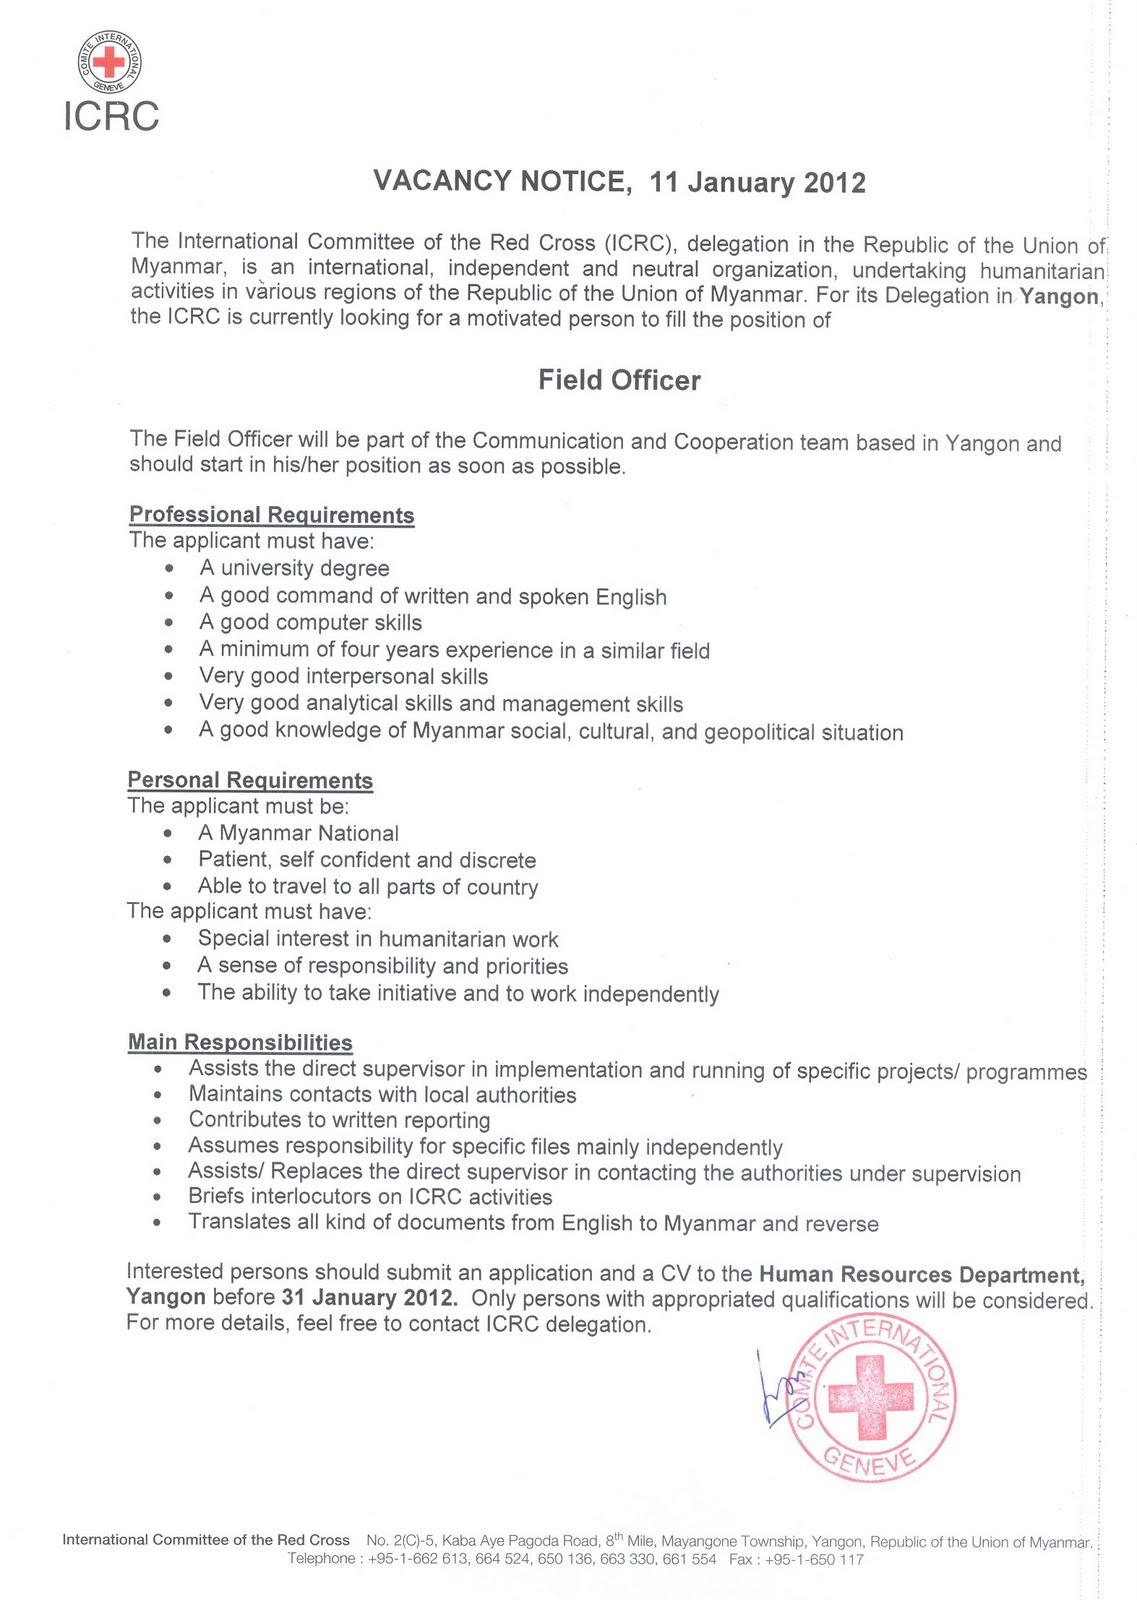 International Committee of the Red Cross (ICRC) | Job Vacancies in ...